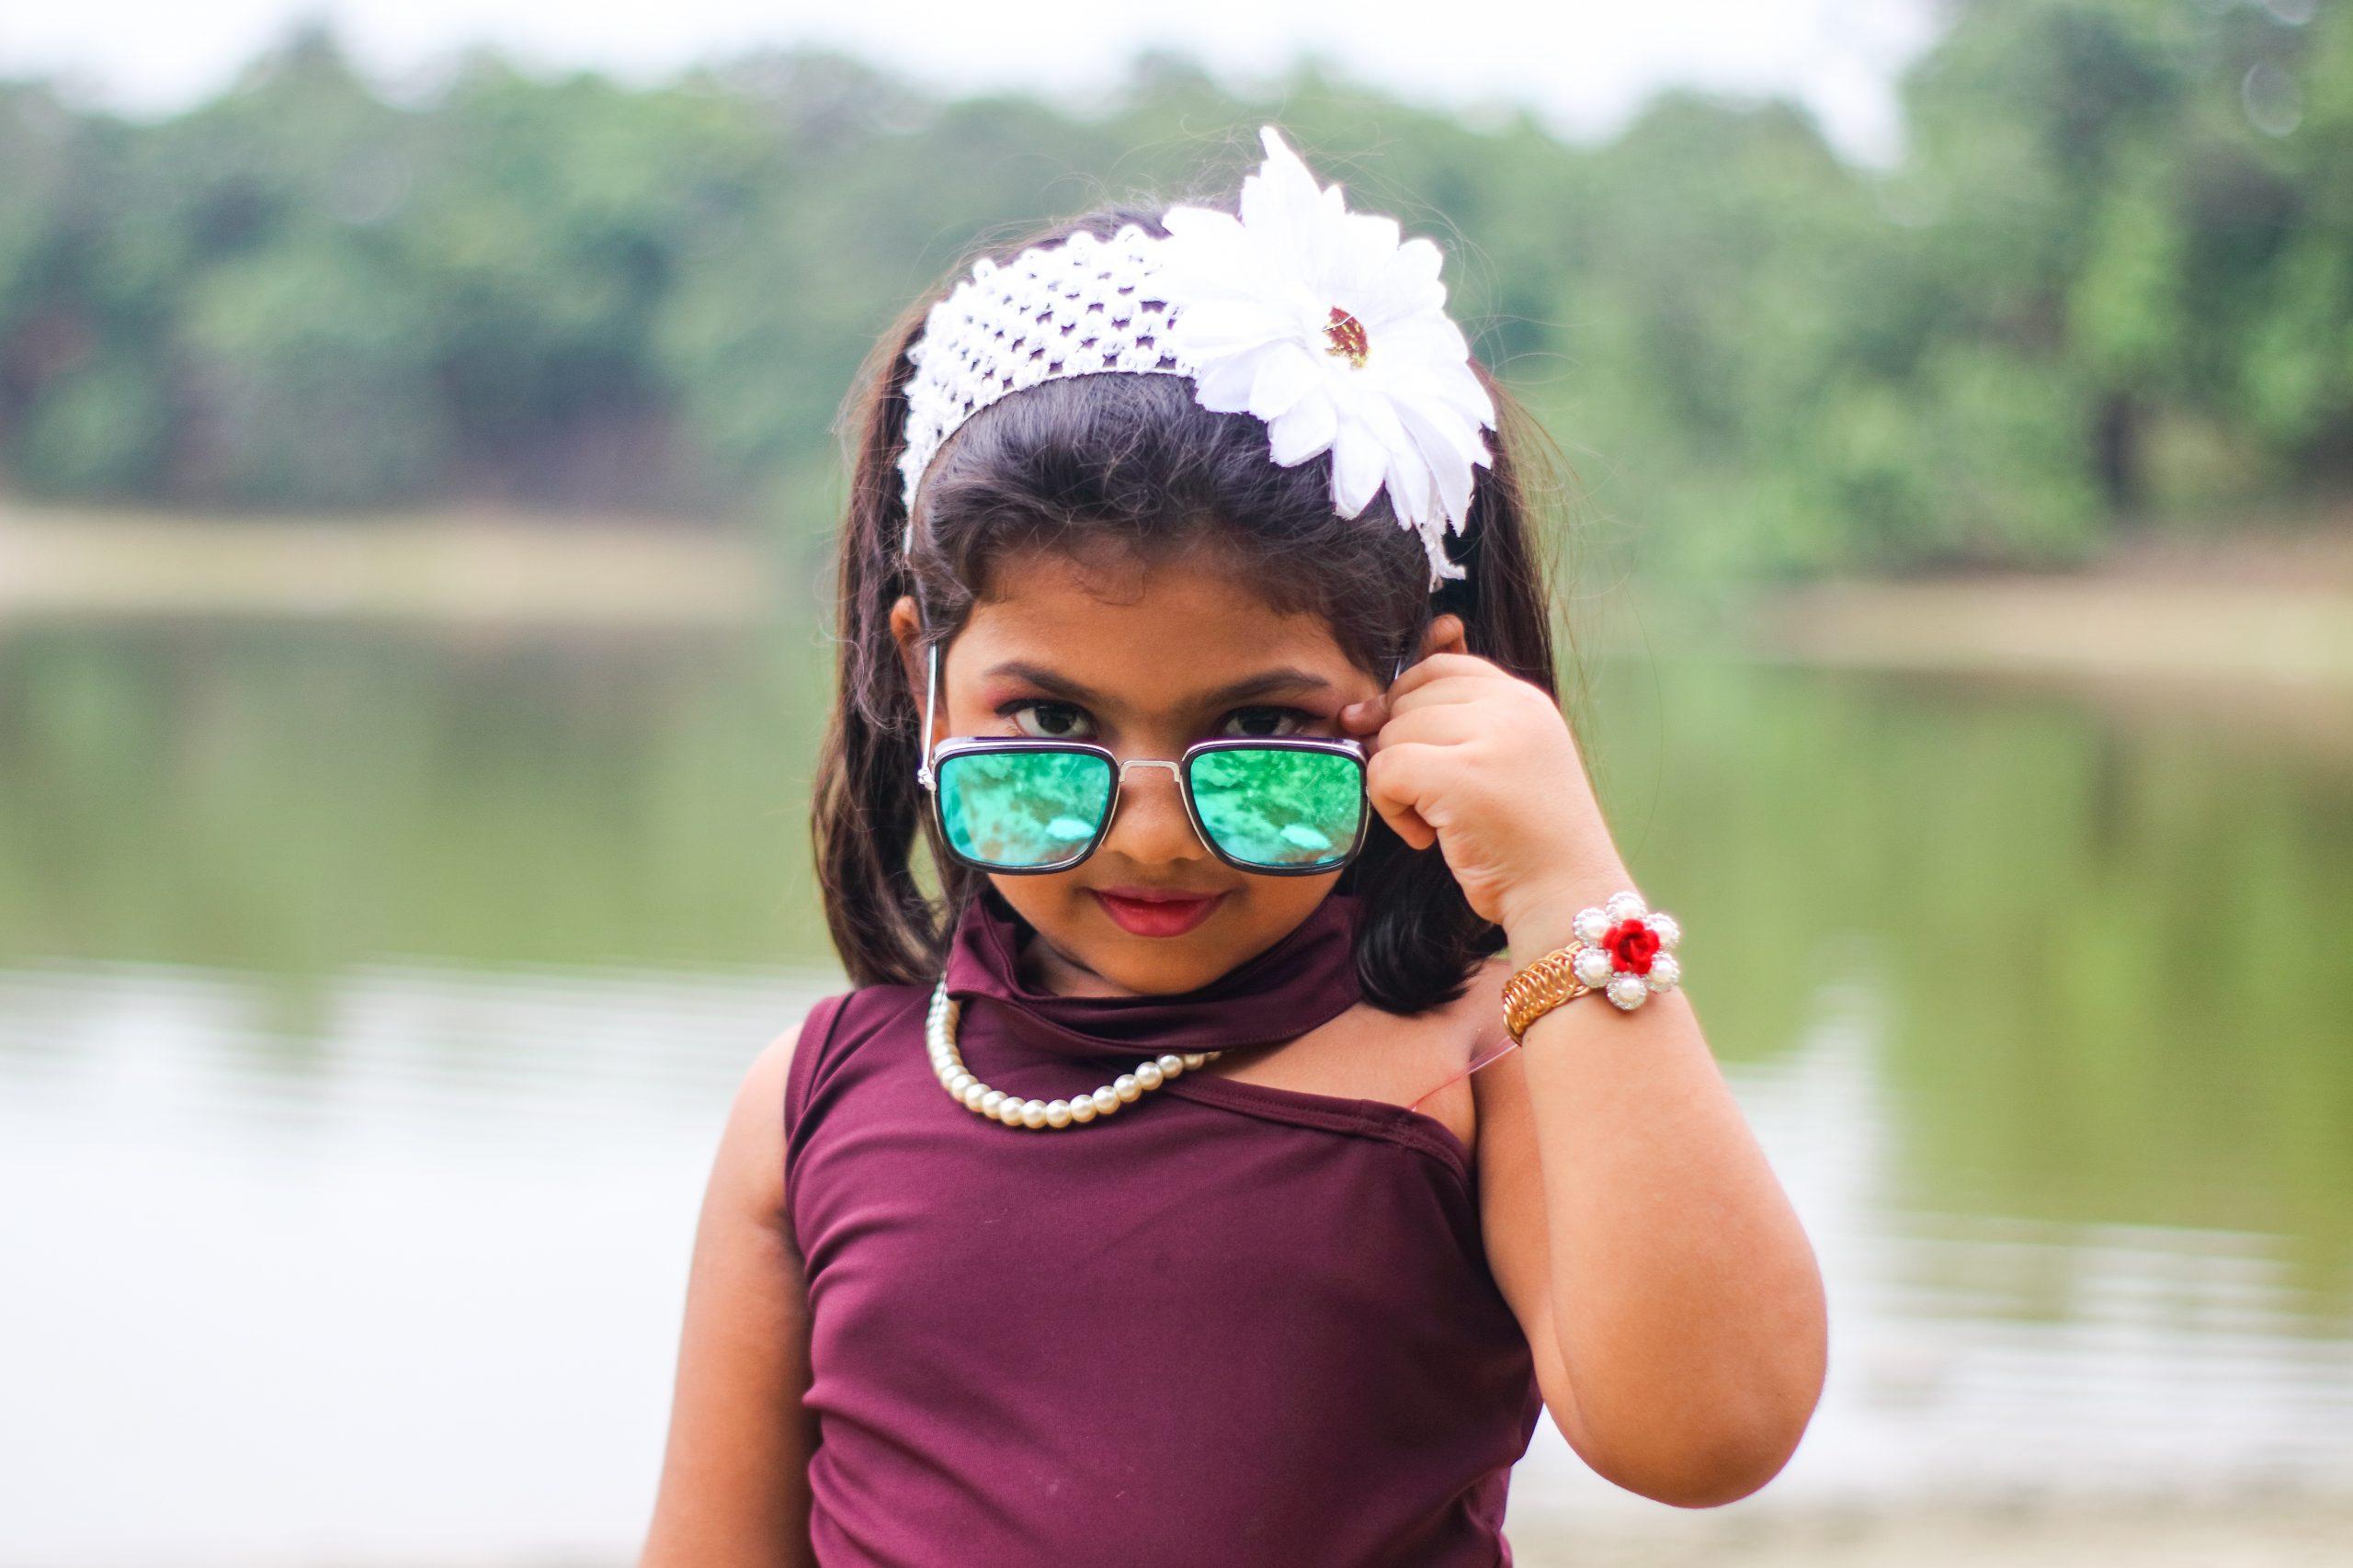 A stylish little girl